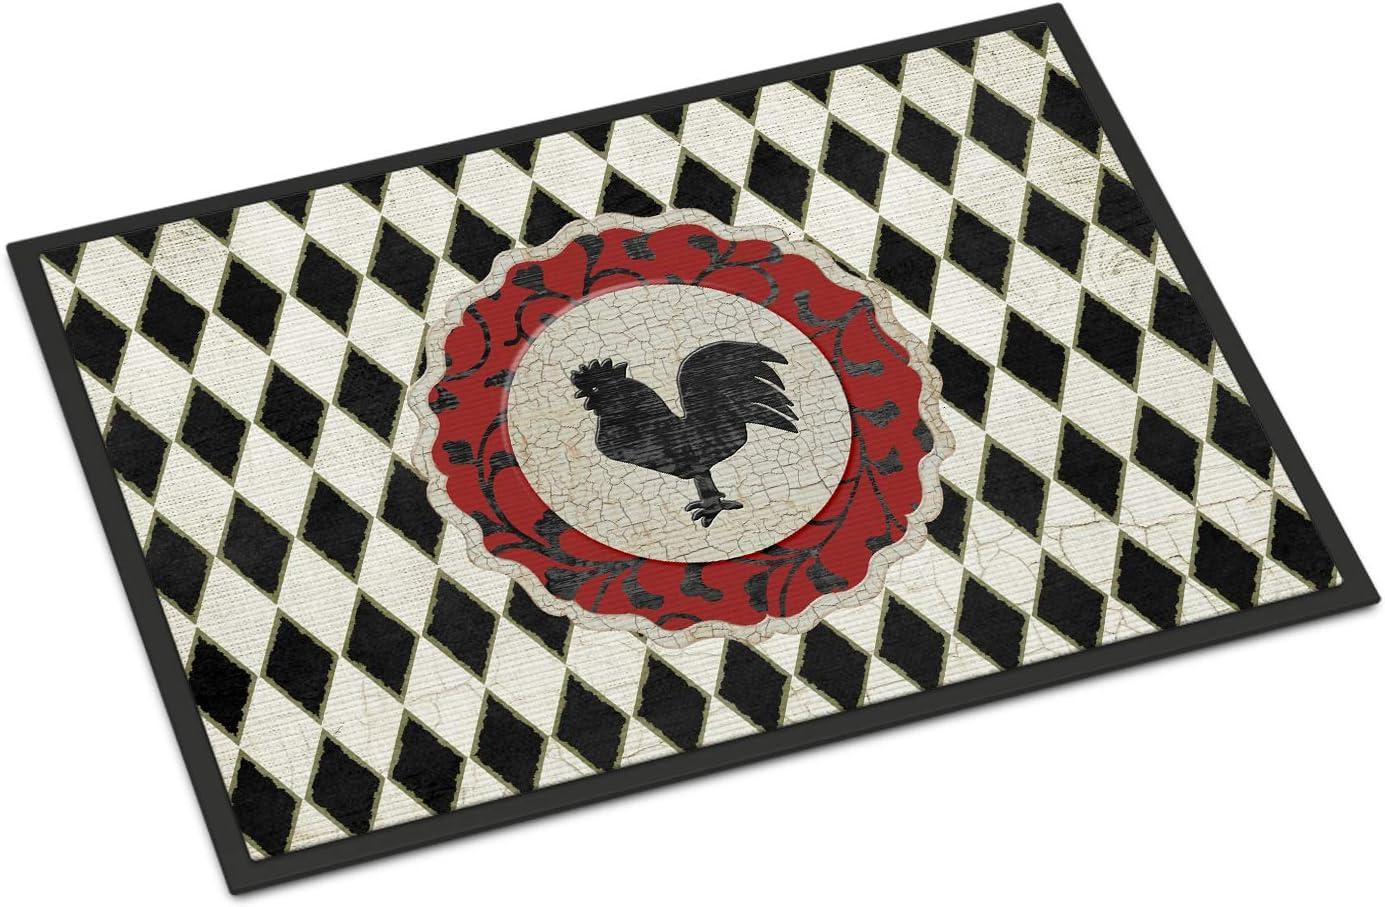 Caroline s Treasures SB3086JMAT Rooster Harlequin Black and White Indoor or Outdoor Mat 24×36, 24H X 36W, Multicolor